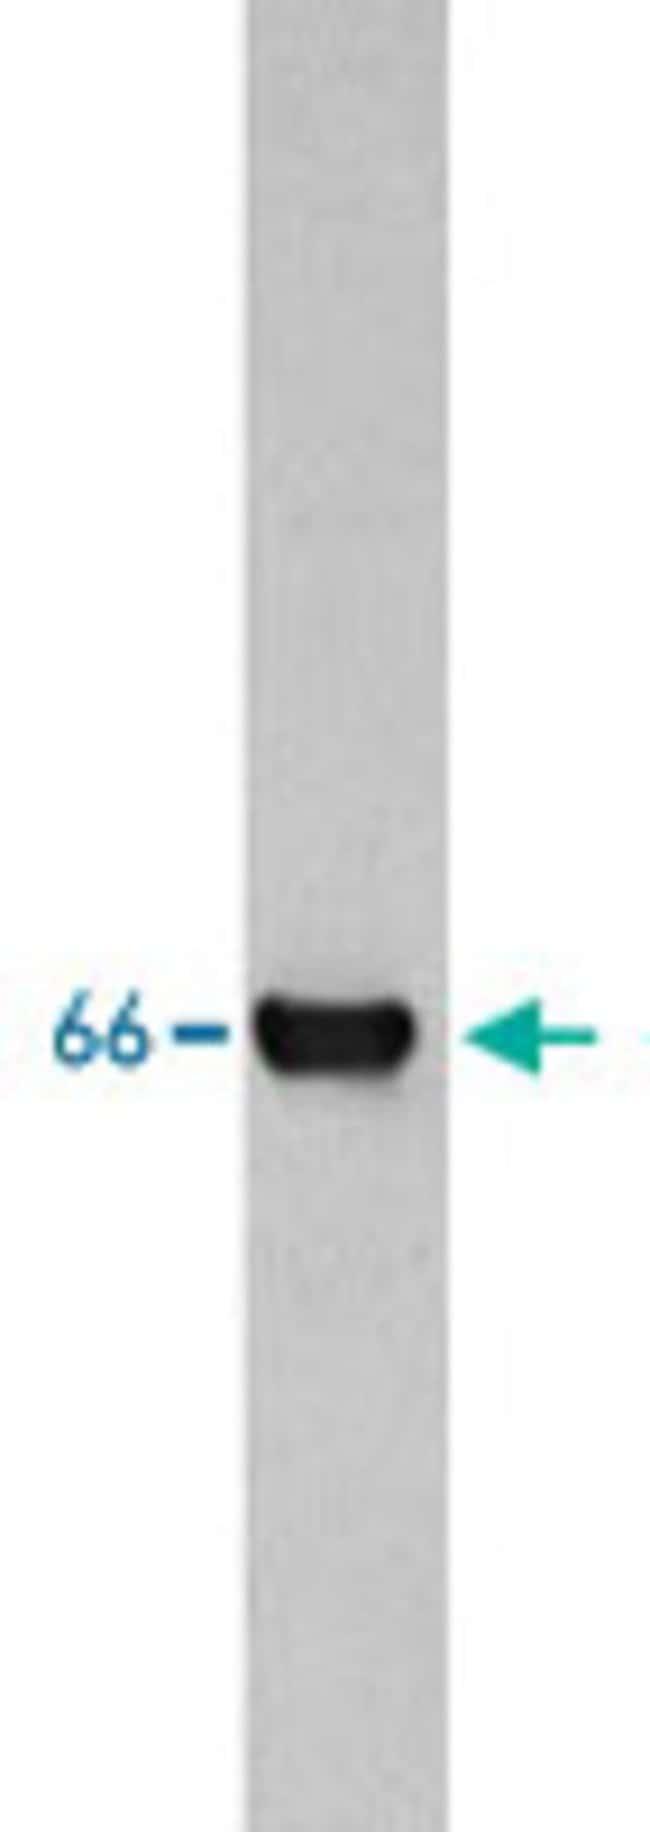 INA Mouse anti-Human, Rat, Clone: 2E3, Abnova 100μL; Unlabeled:Antibodies